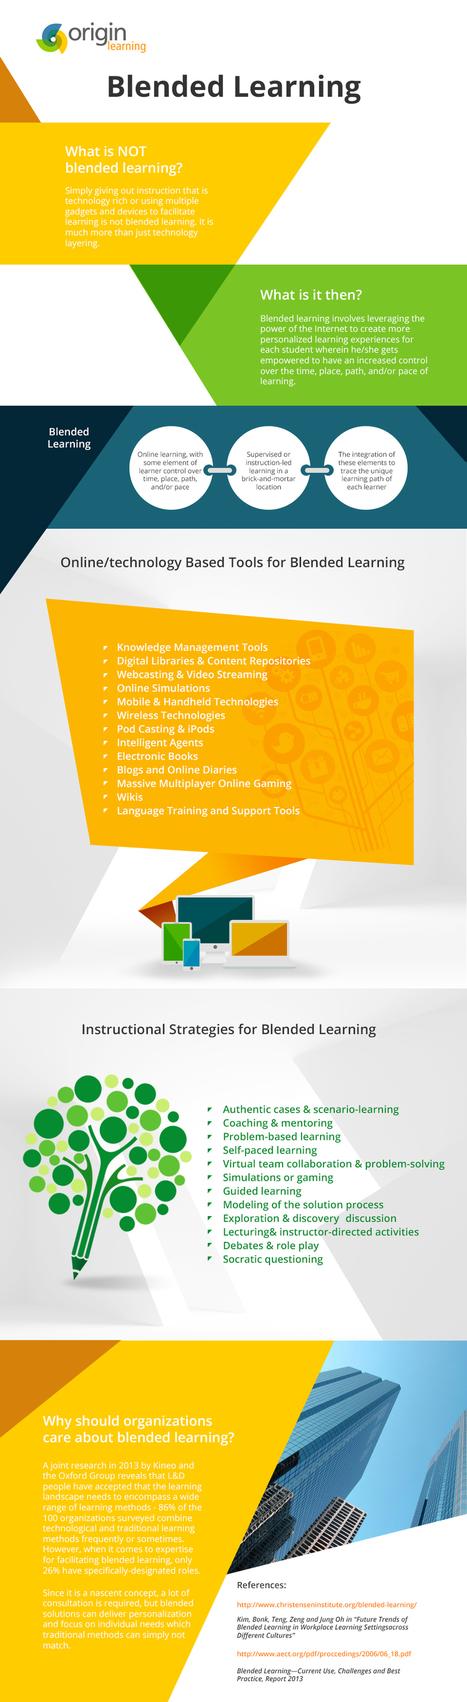 The Mystery of Blended Learning Infographic | Zentrum für multimediales Lehren und Lernen (LLZ) | Scoop.it